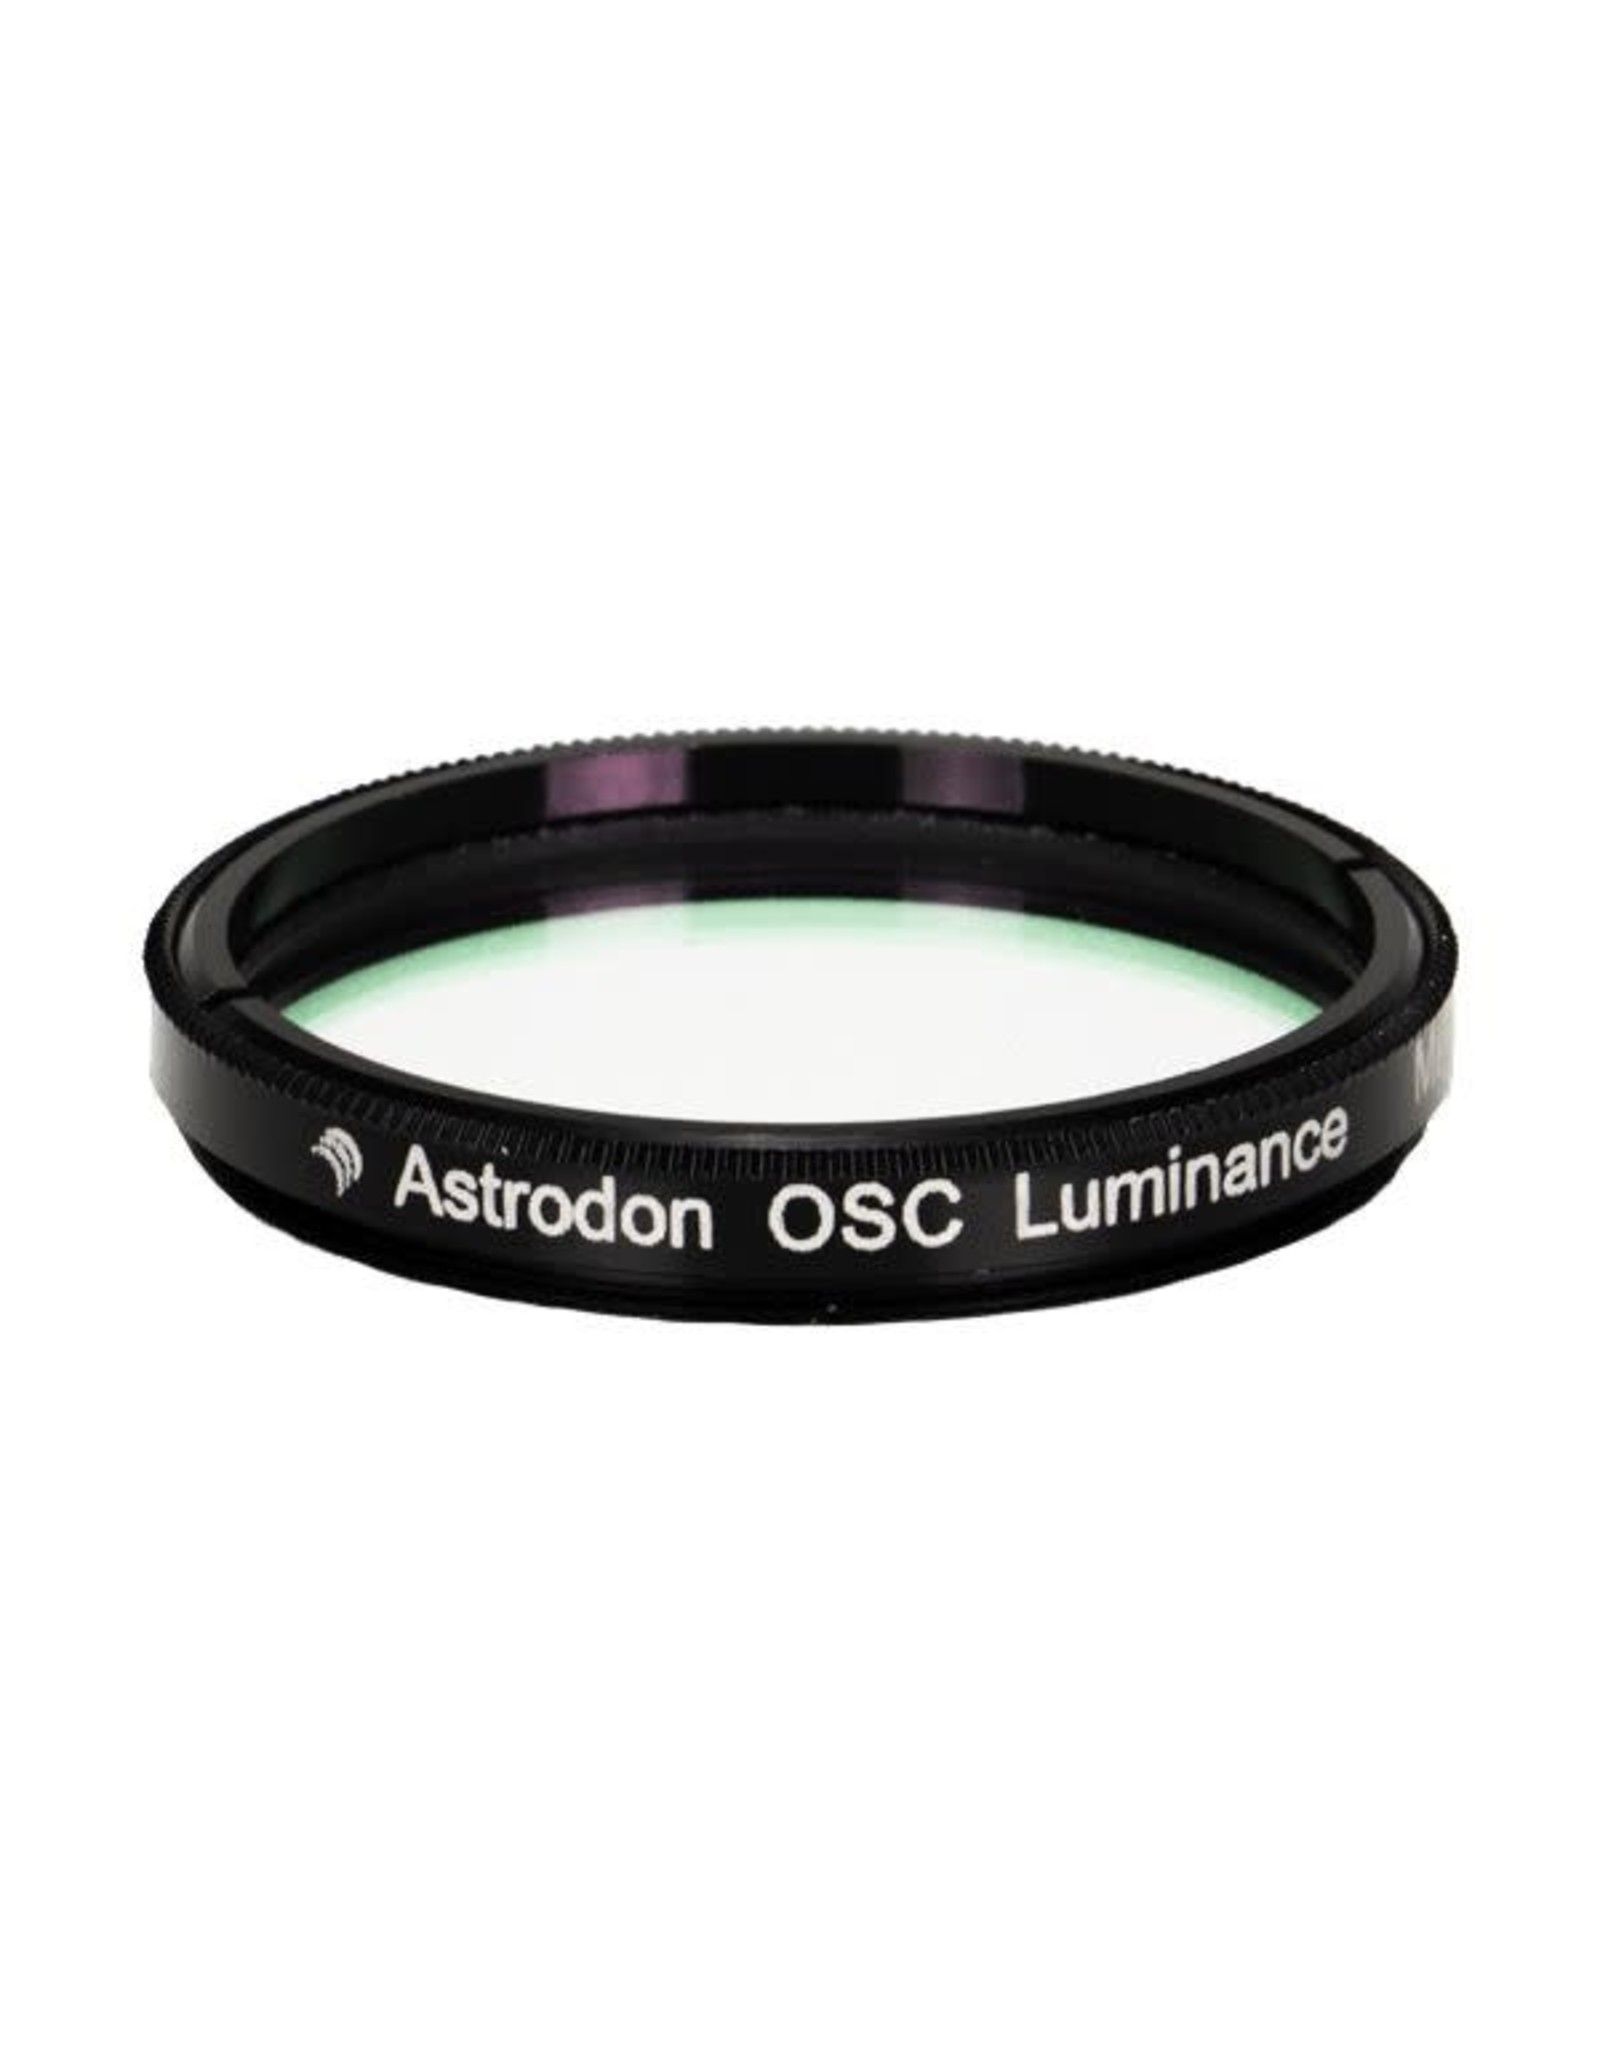 "Astrodon Astrodon 1.25"" One Shot Color Luminance UV/IR Cut Filter - OSCL125"